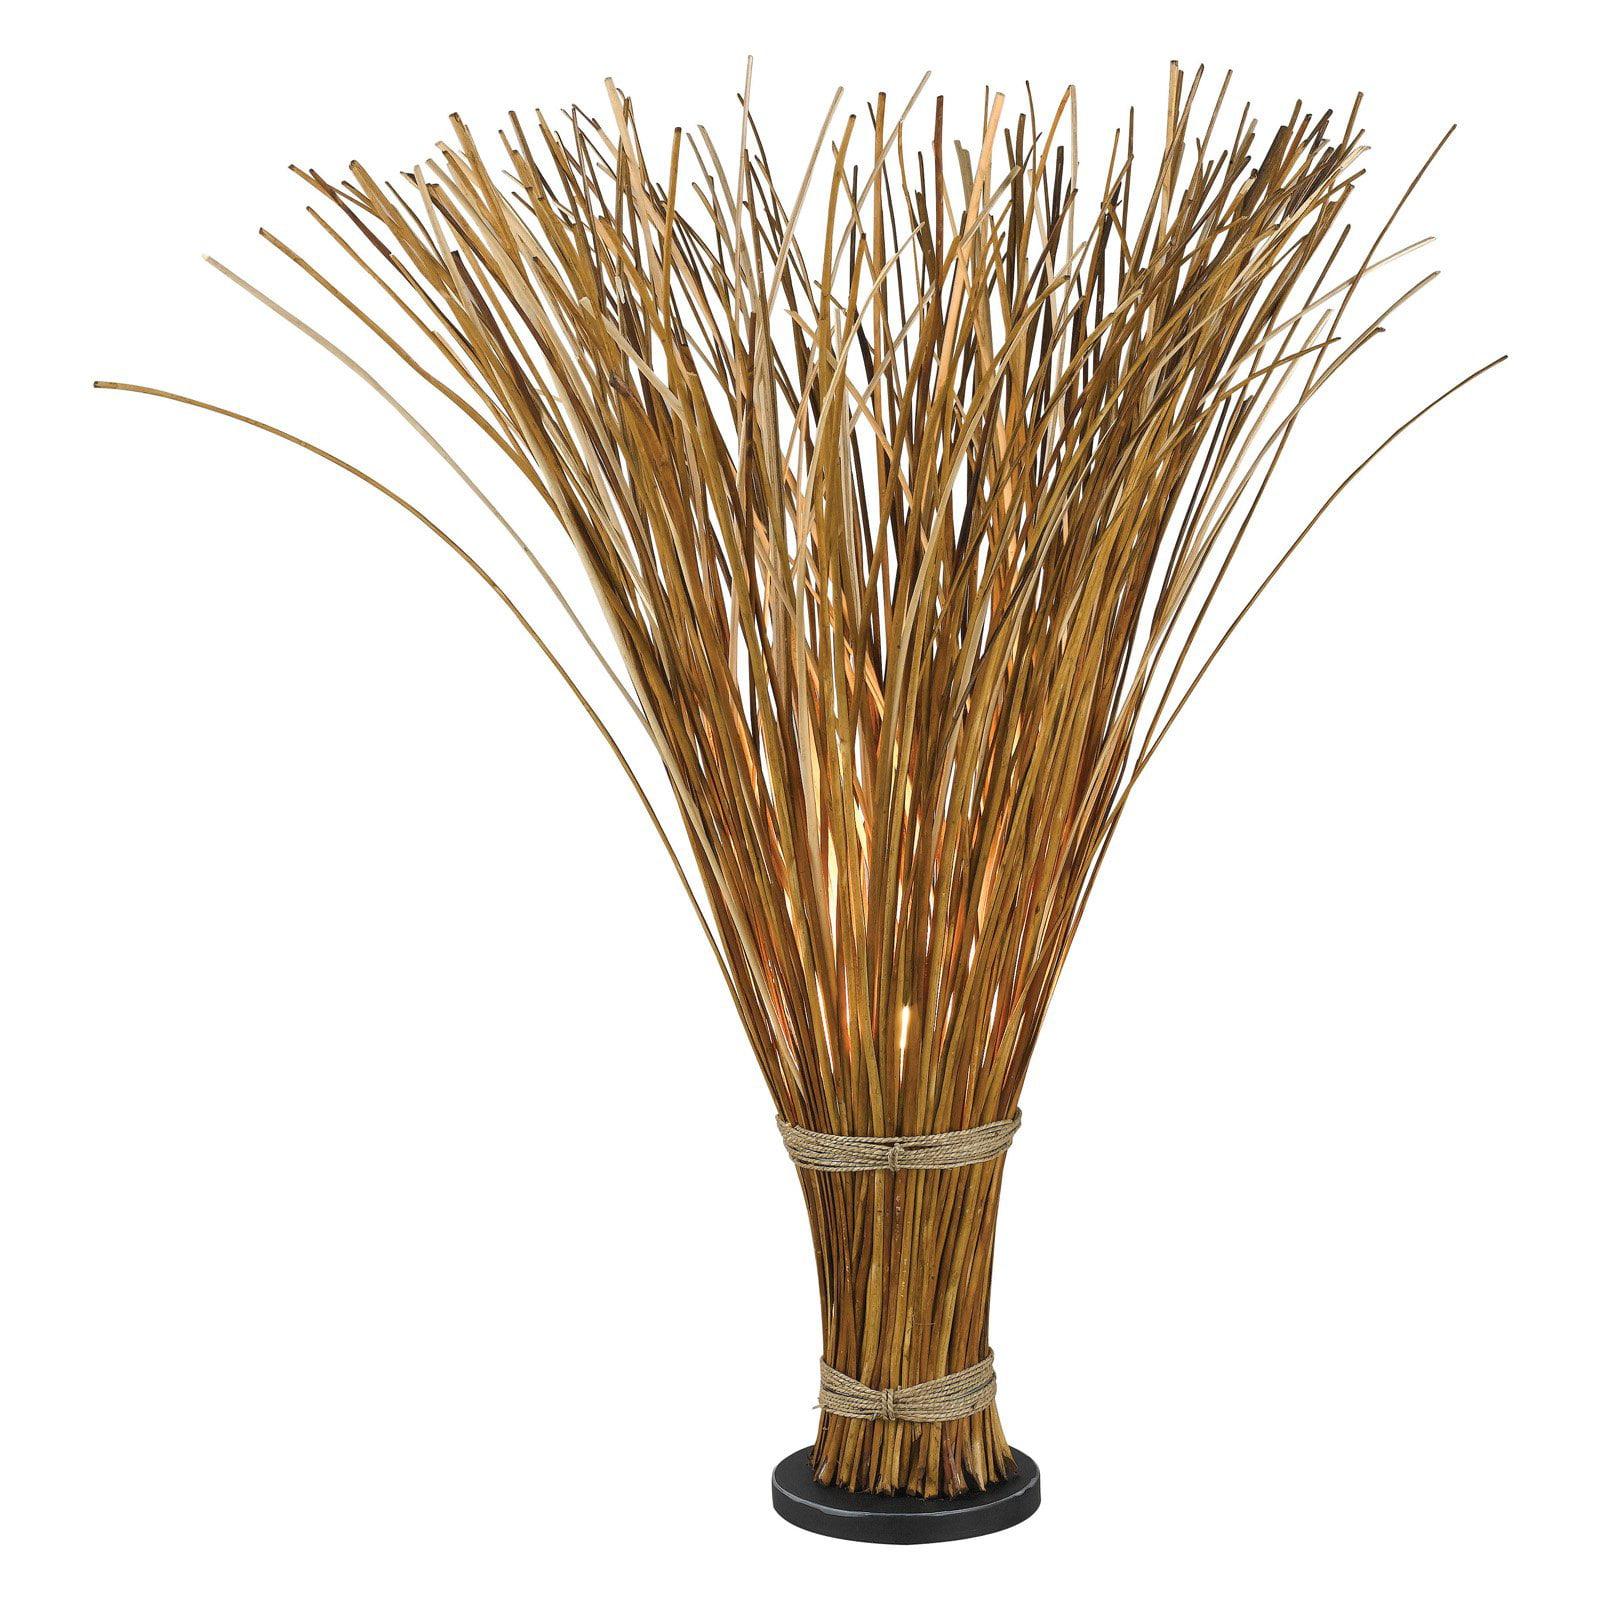 Kenroy Home Sheaf Floor Lamp, Natural Reed